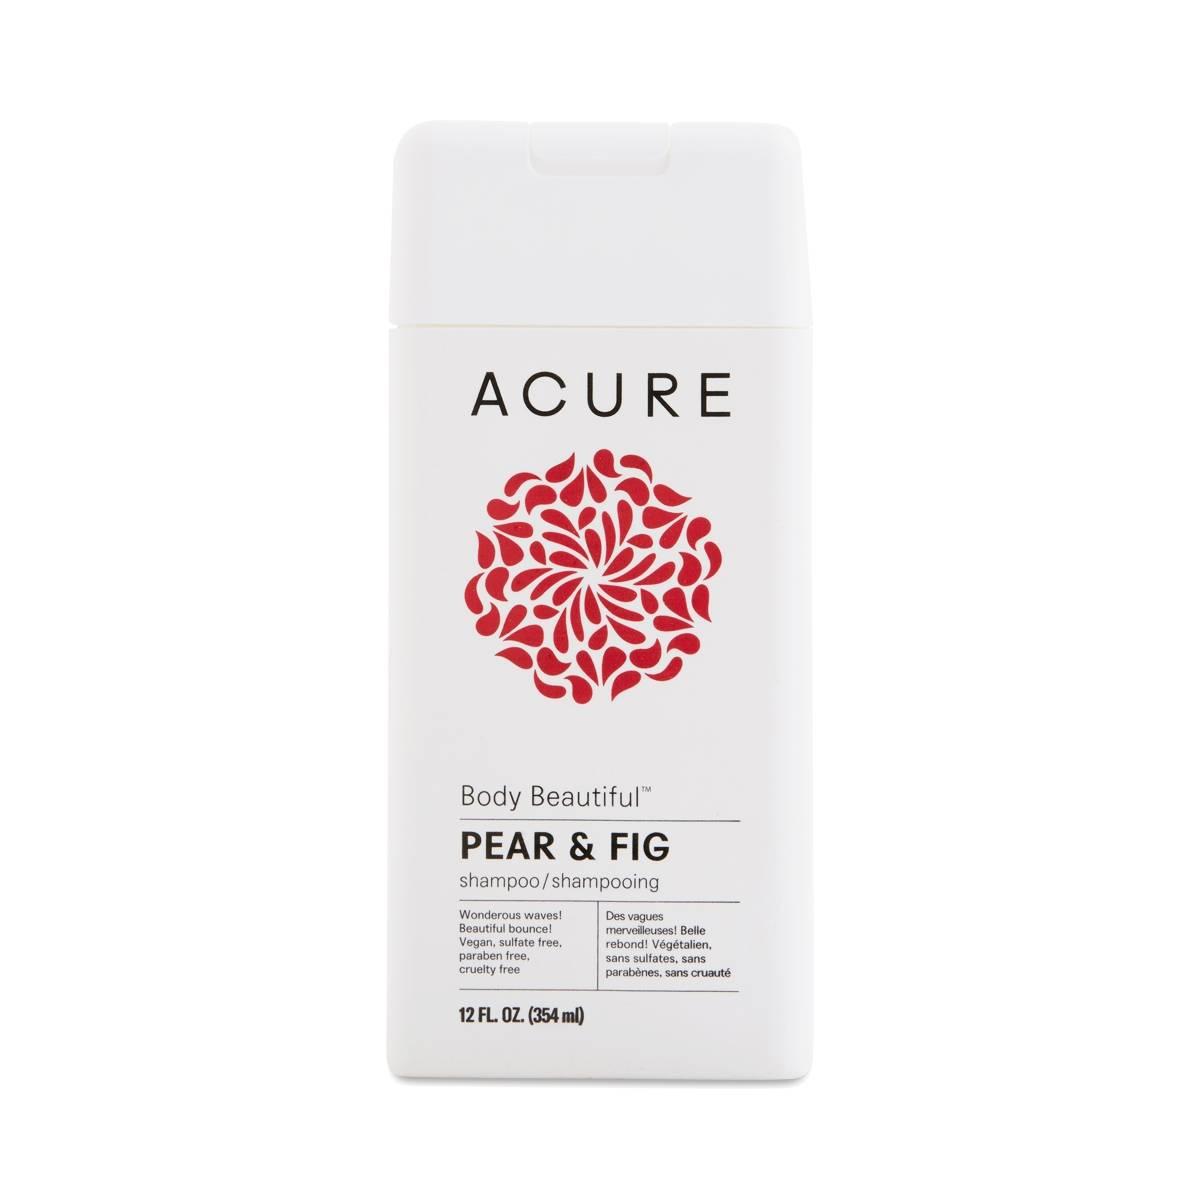 Acure Body Beautiful Shampoo